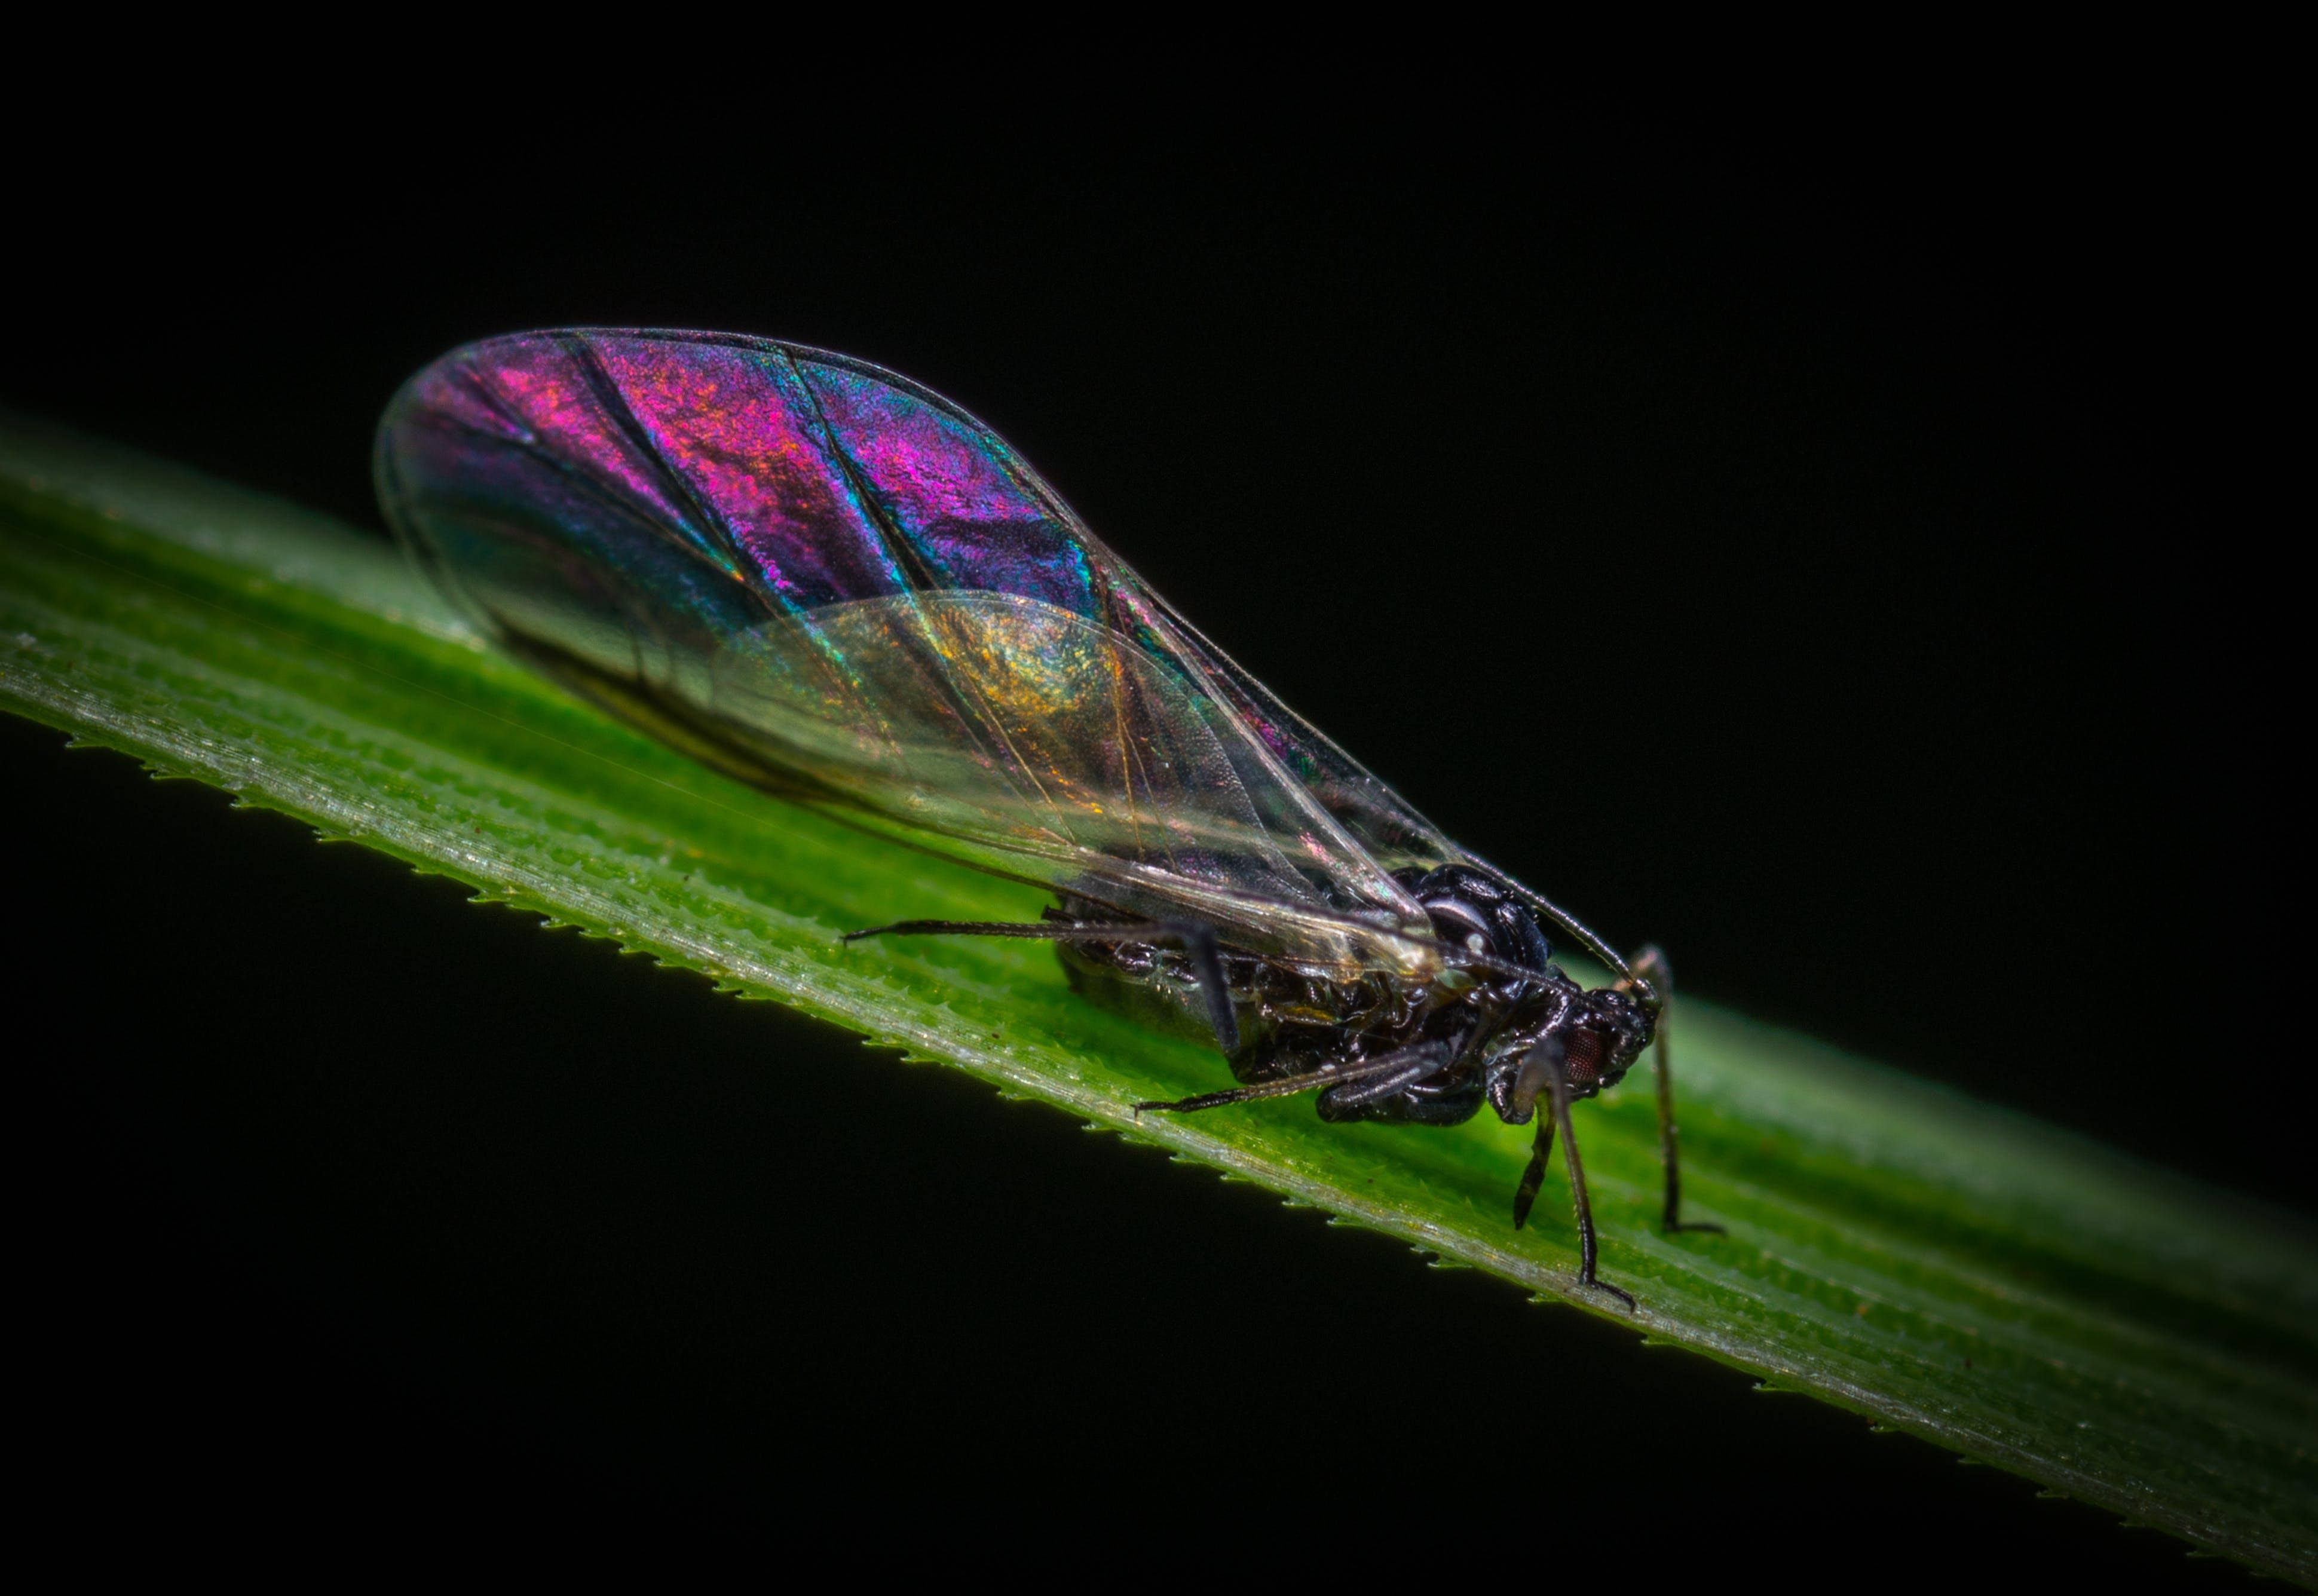 Purple, Black, and Brown Cicada on Green Leaf